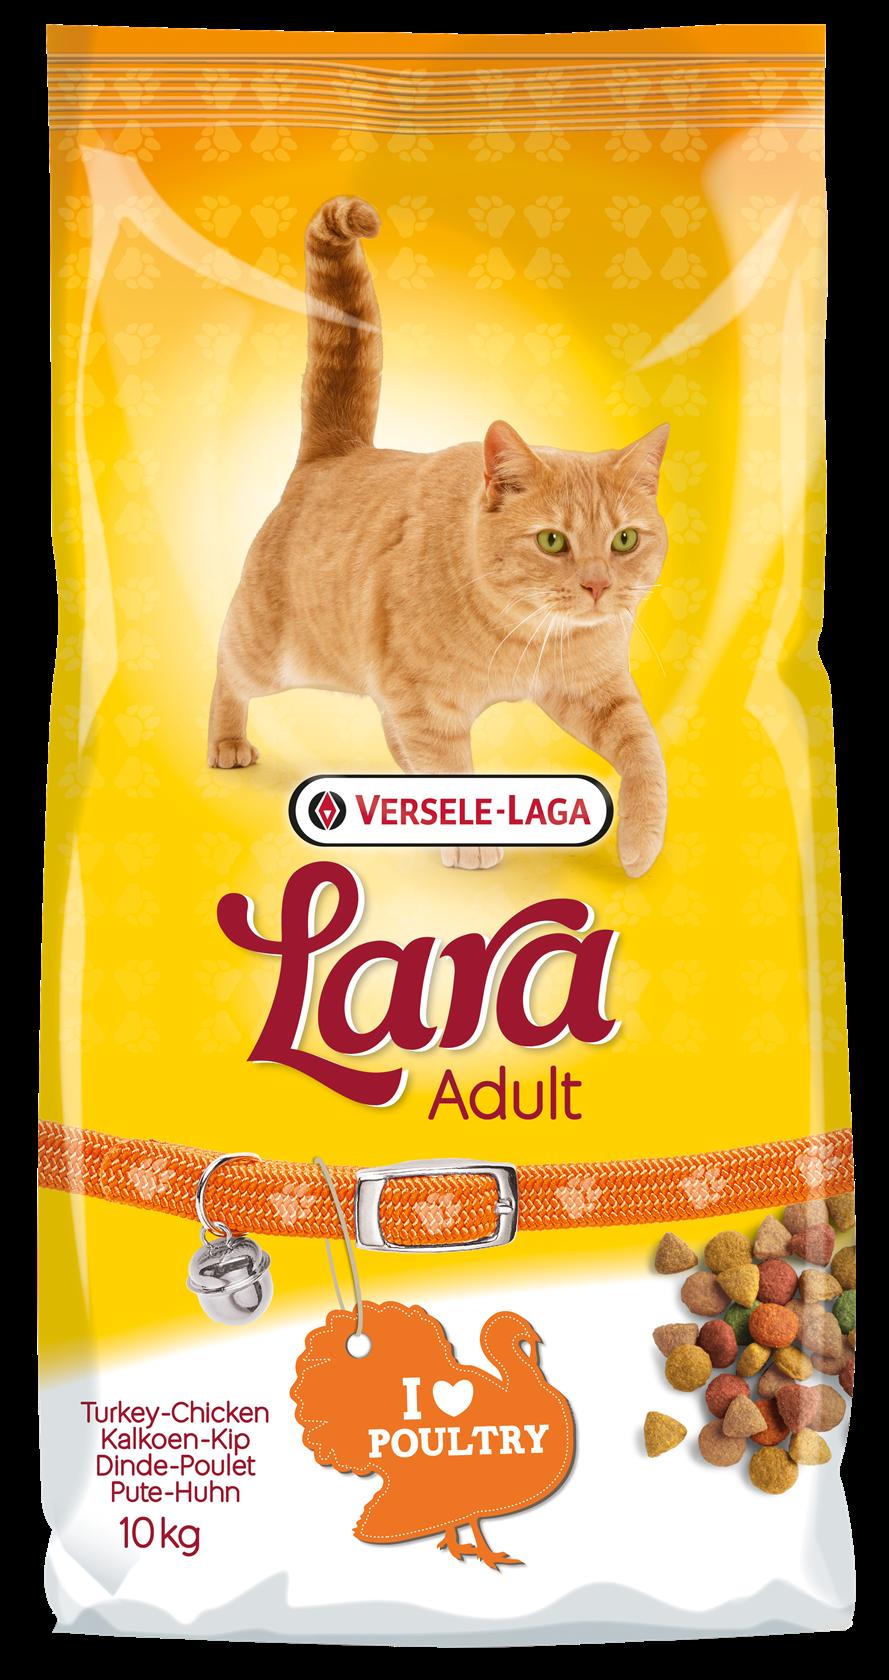 Lara Adult Kalkoen & Kip 10kg